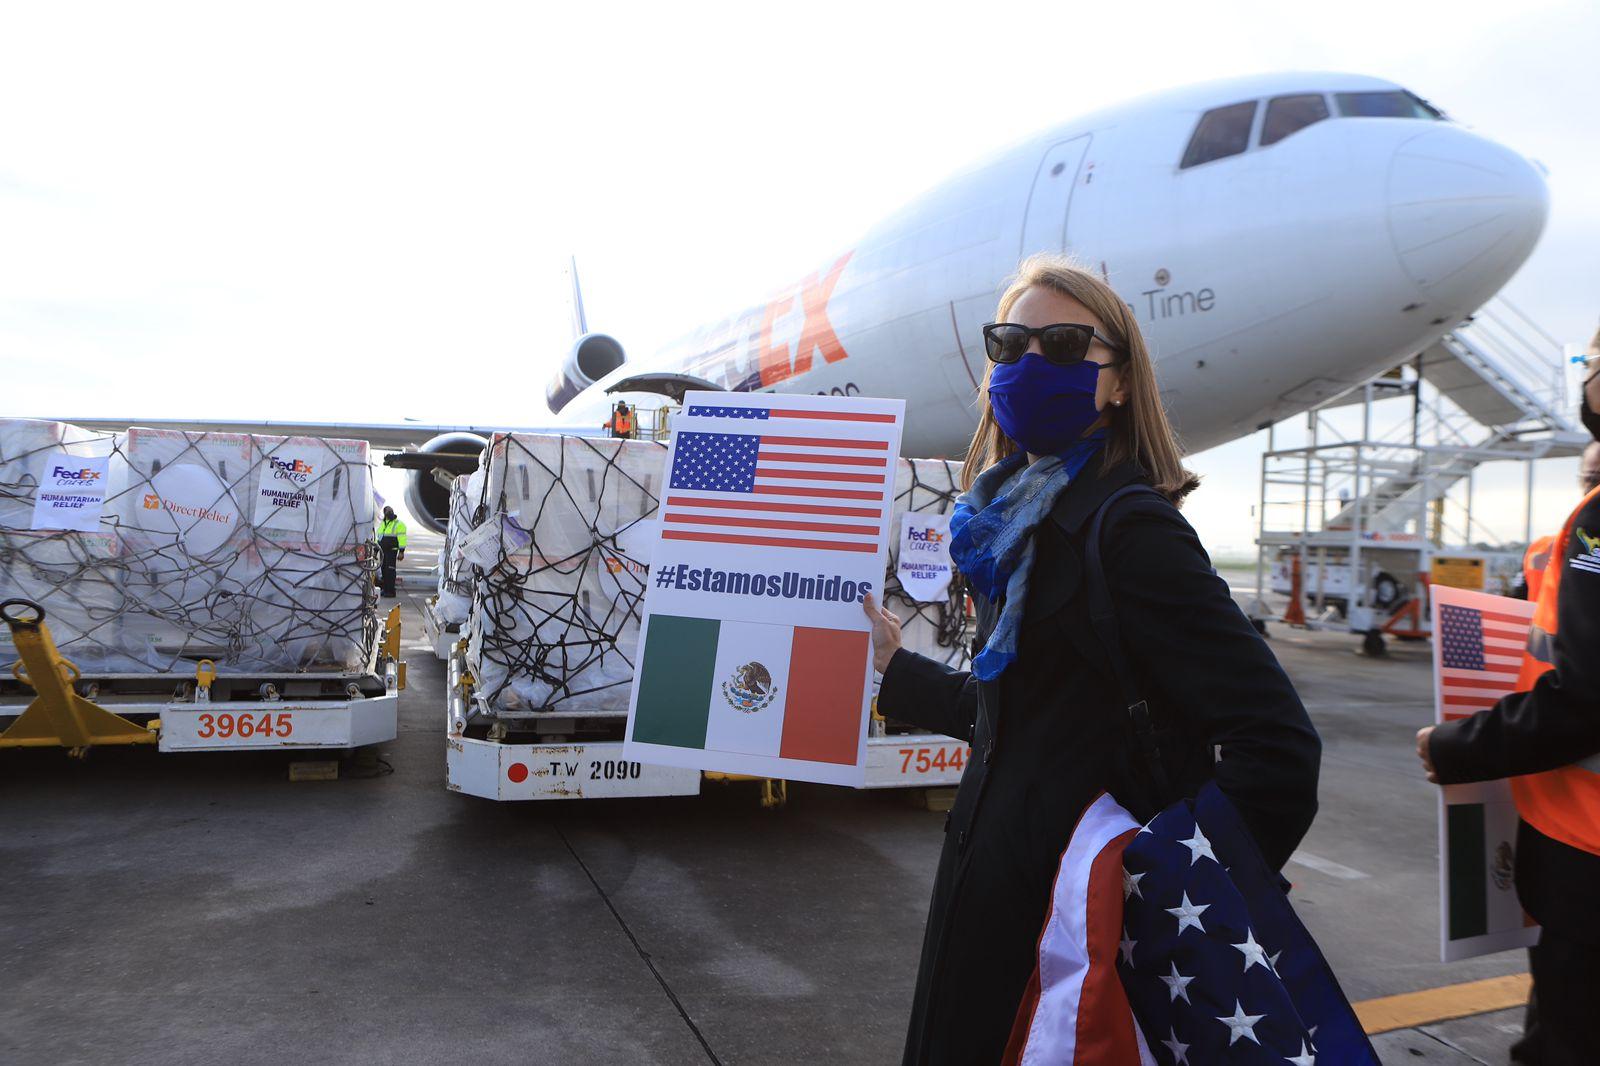 Llega a México primer embarque de vacunas Moderna a la Aduana de Toluca: Horacio Duarte - Ago 24, 2021